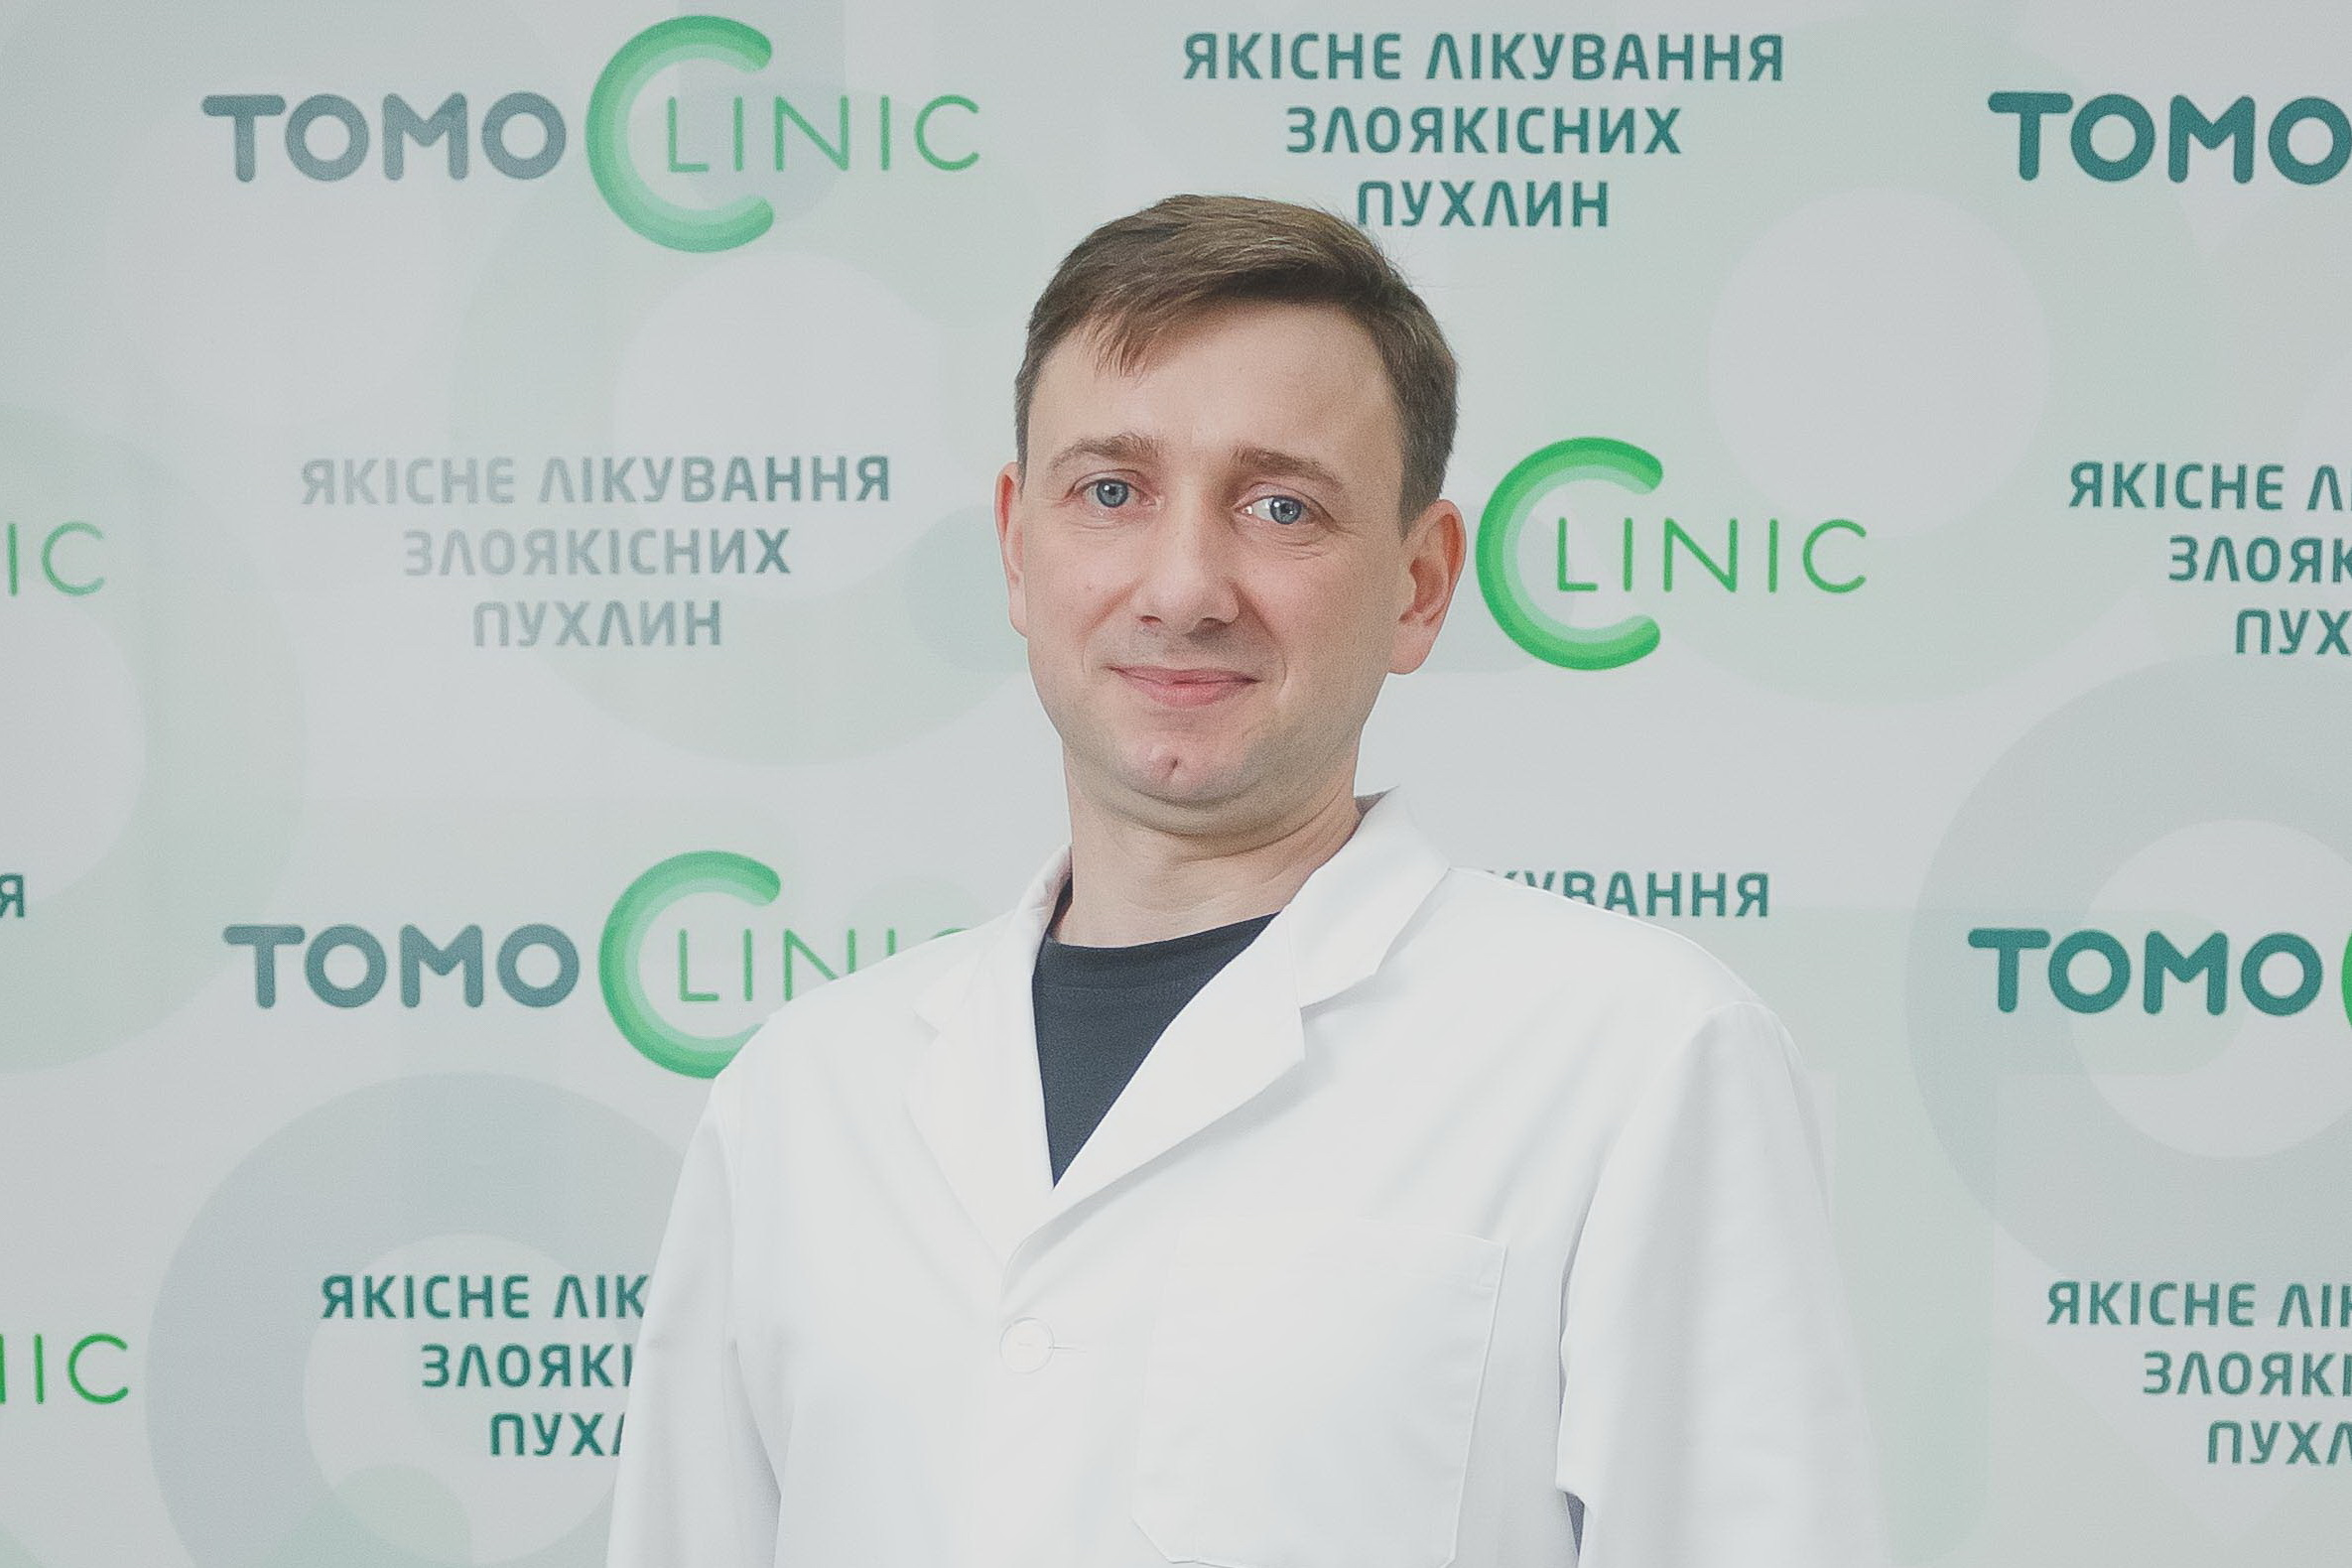 онкология гинекология пандемия